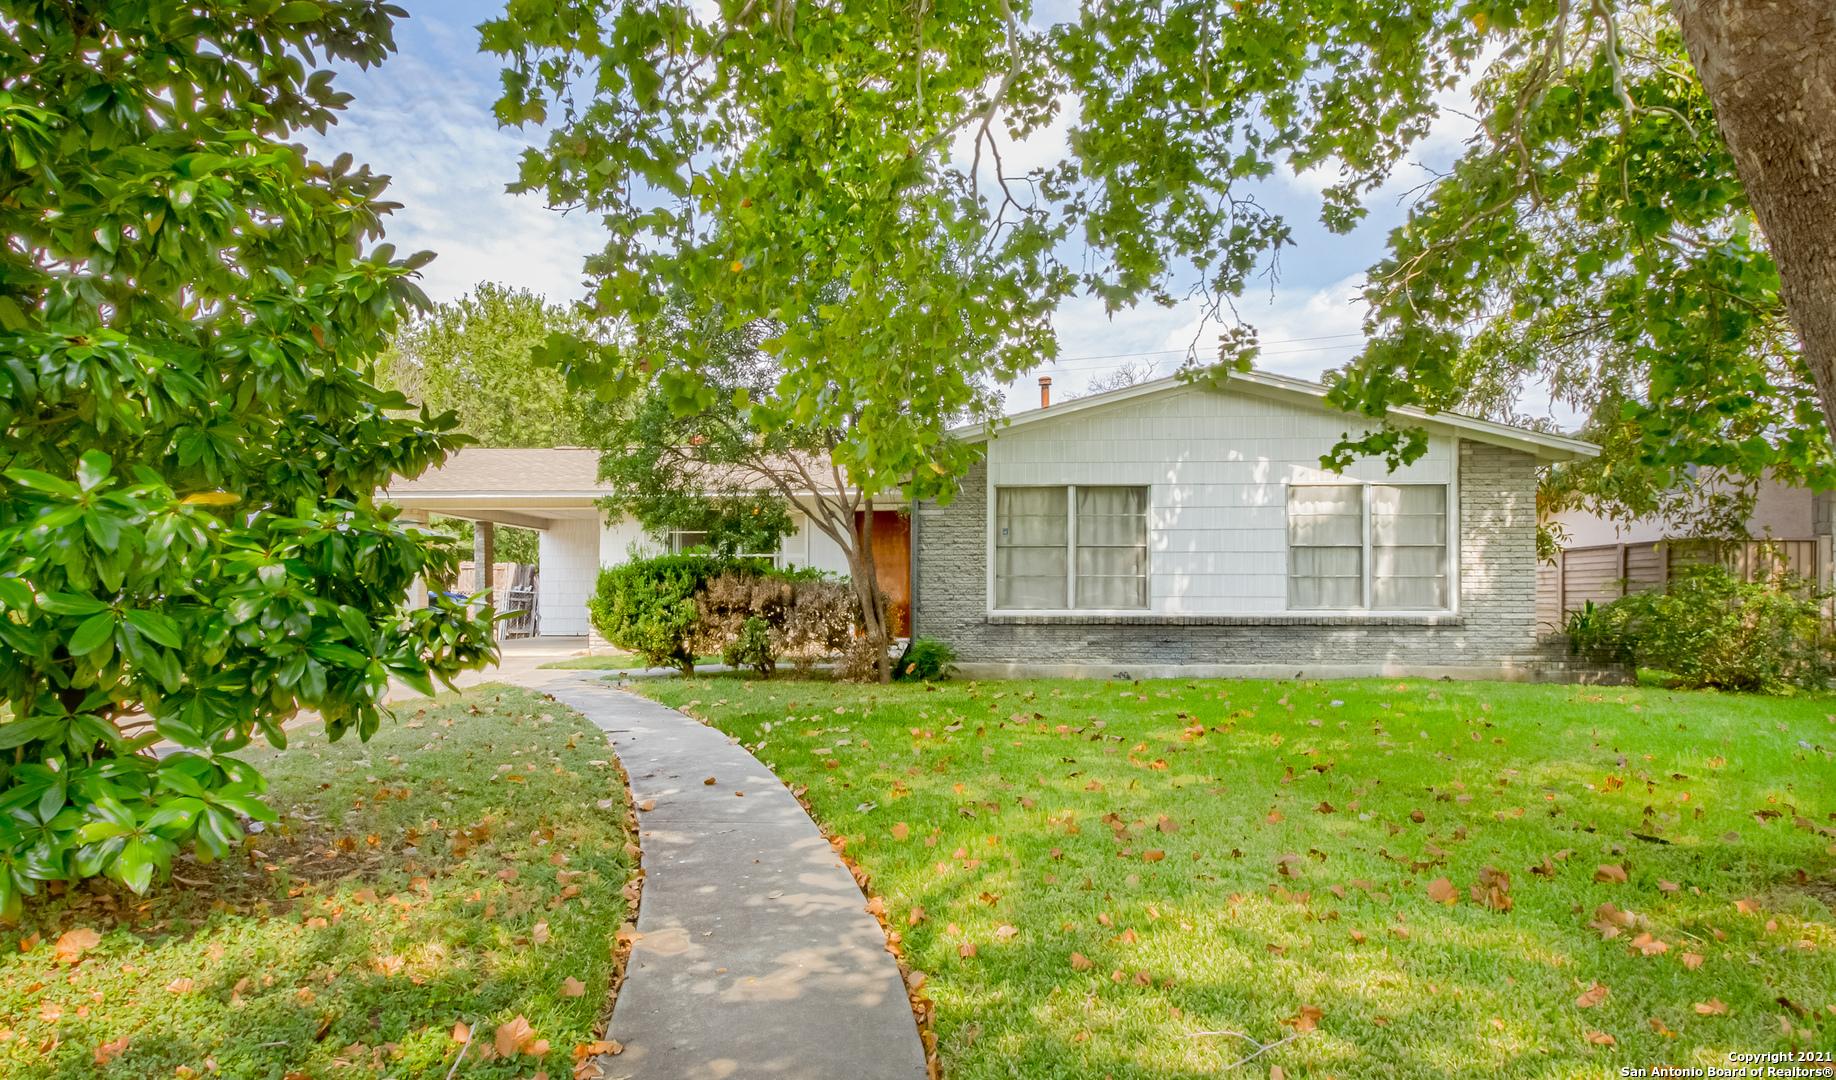 471 Hialeah Ave, San Antonio, TX 78218